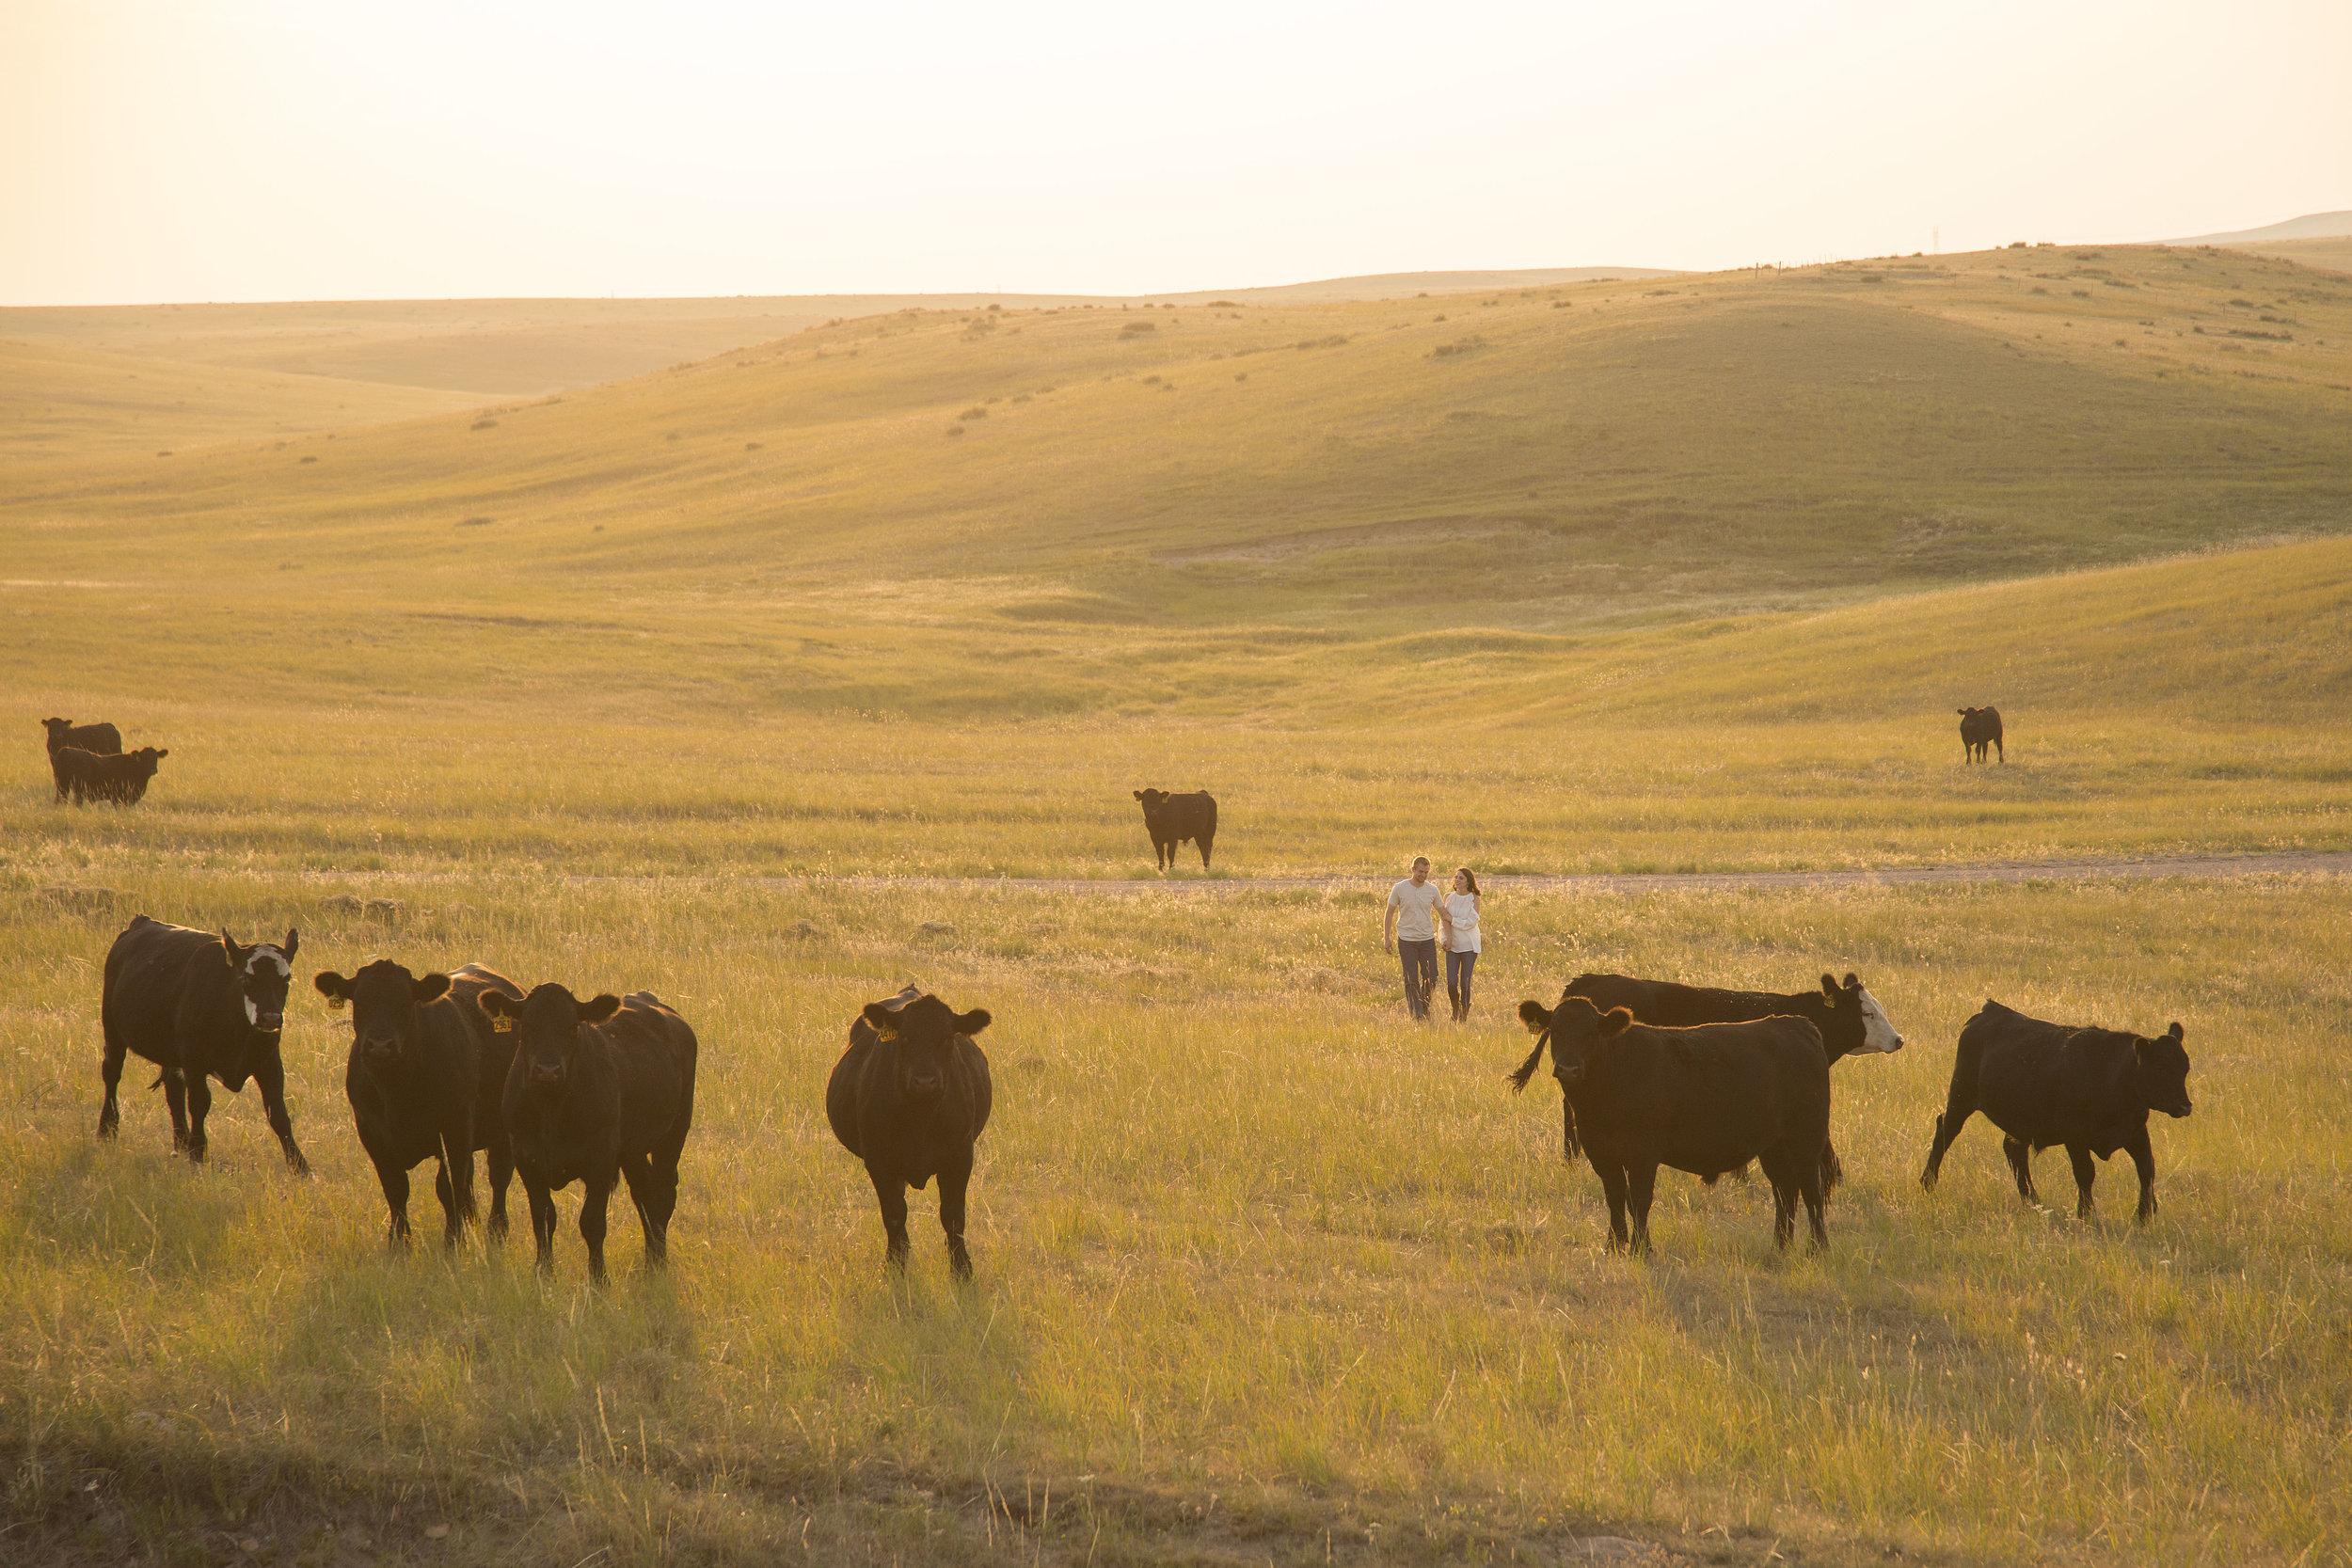 Cows engagement photo